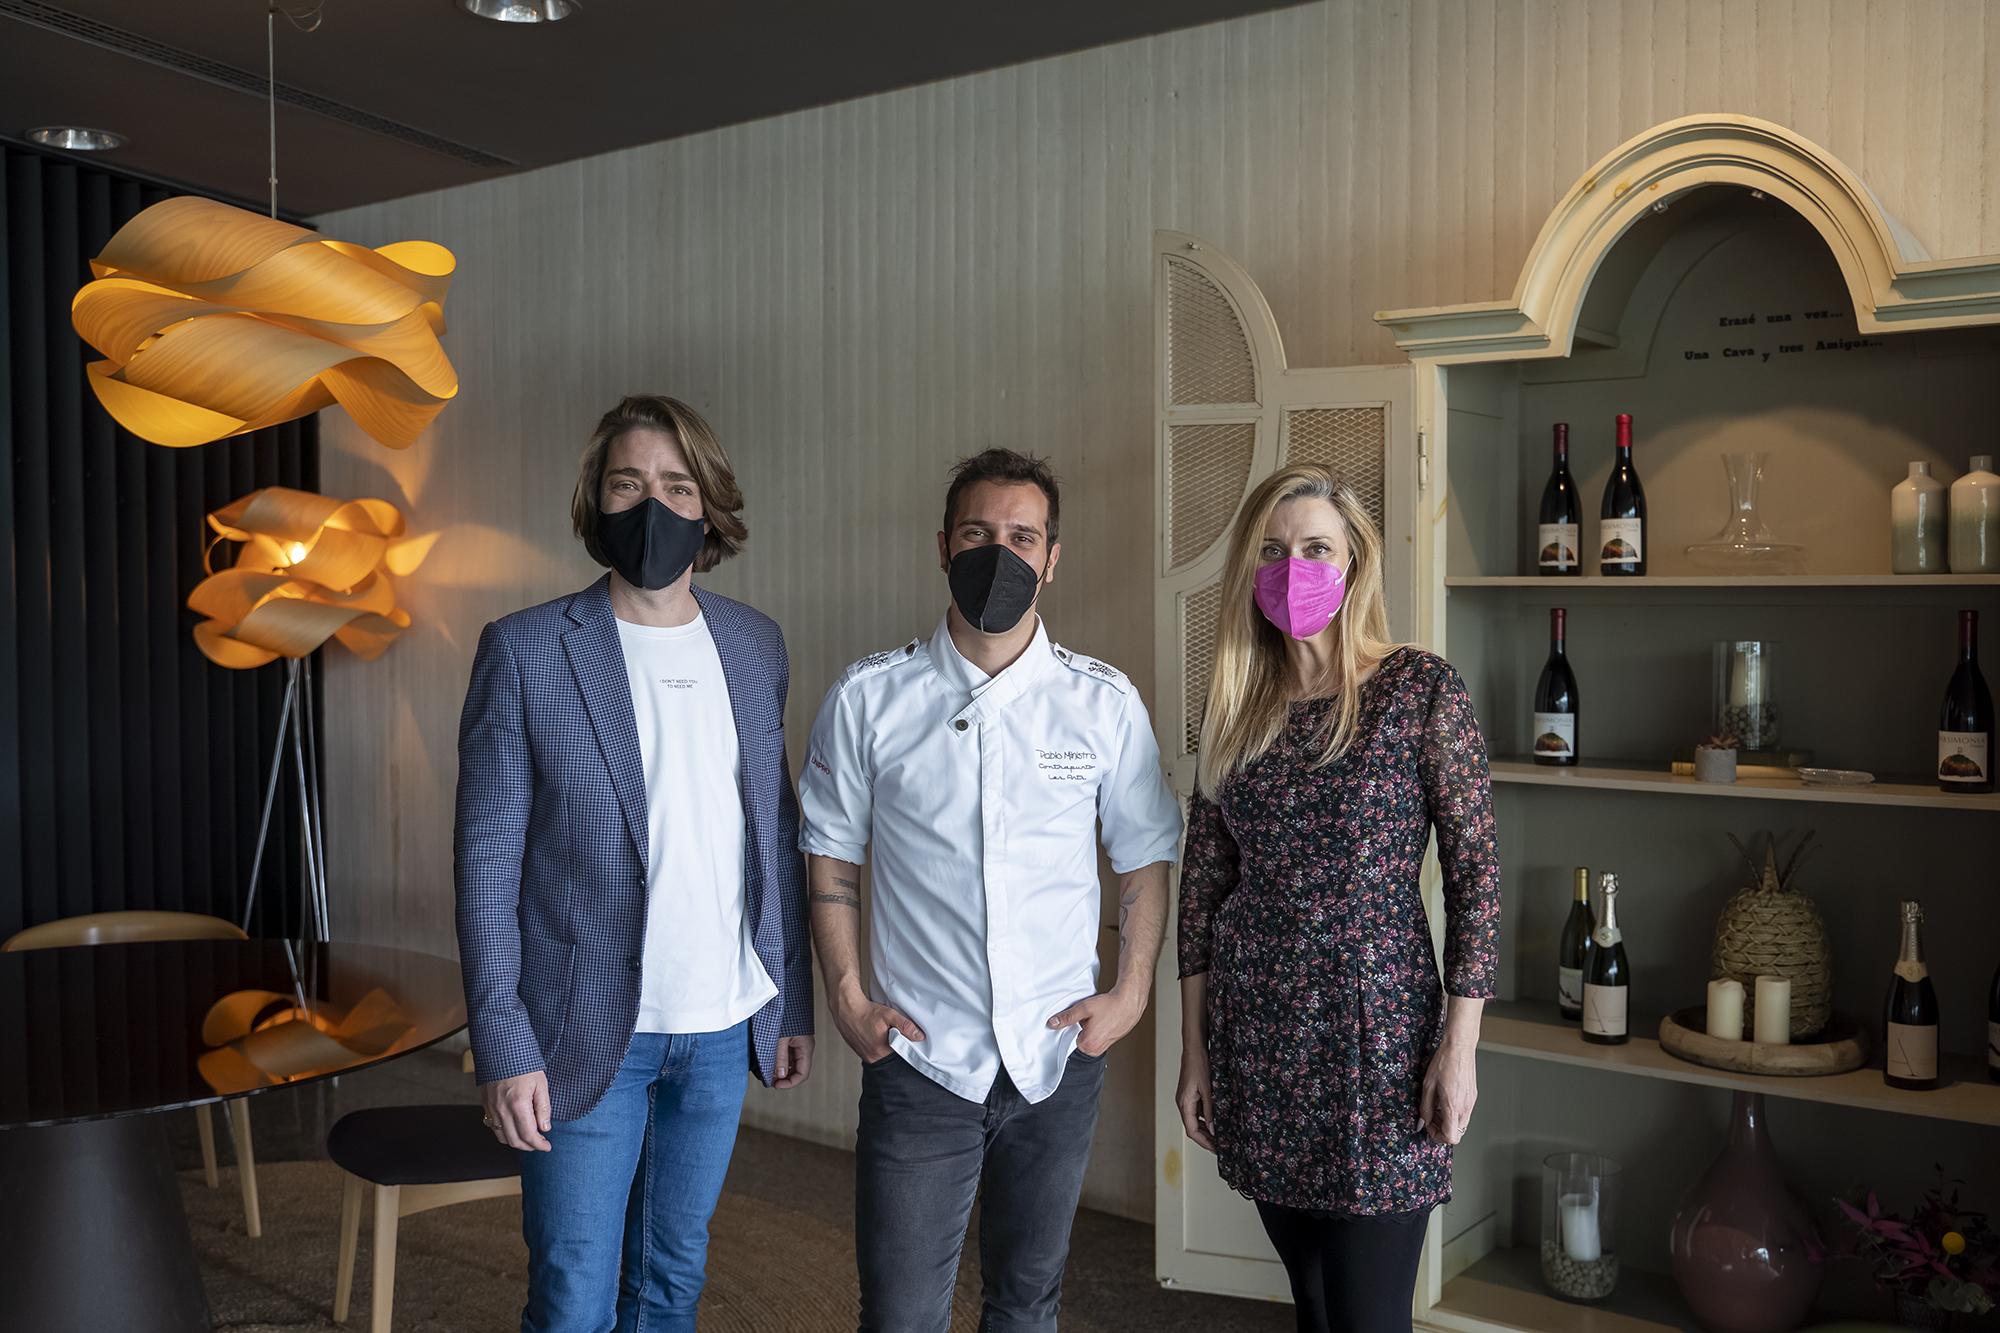 Les Arts fusiona lírica i gastronomia de la mà de Pablo Ministro